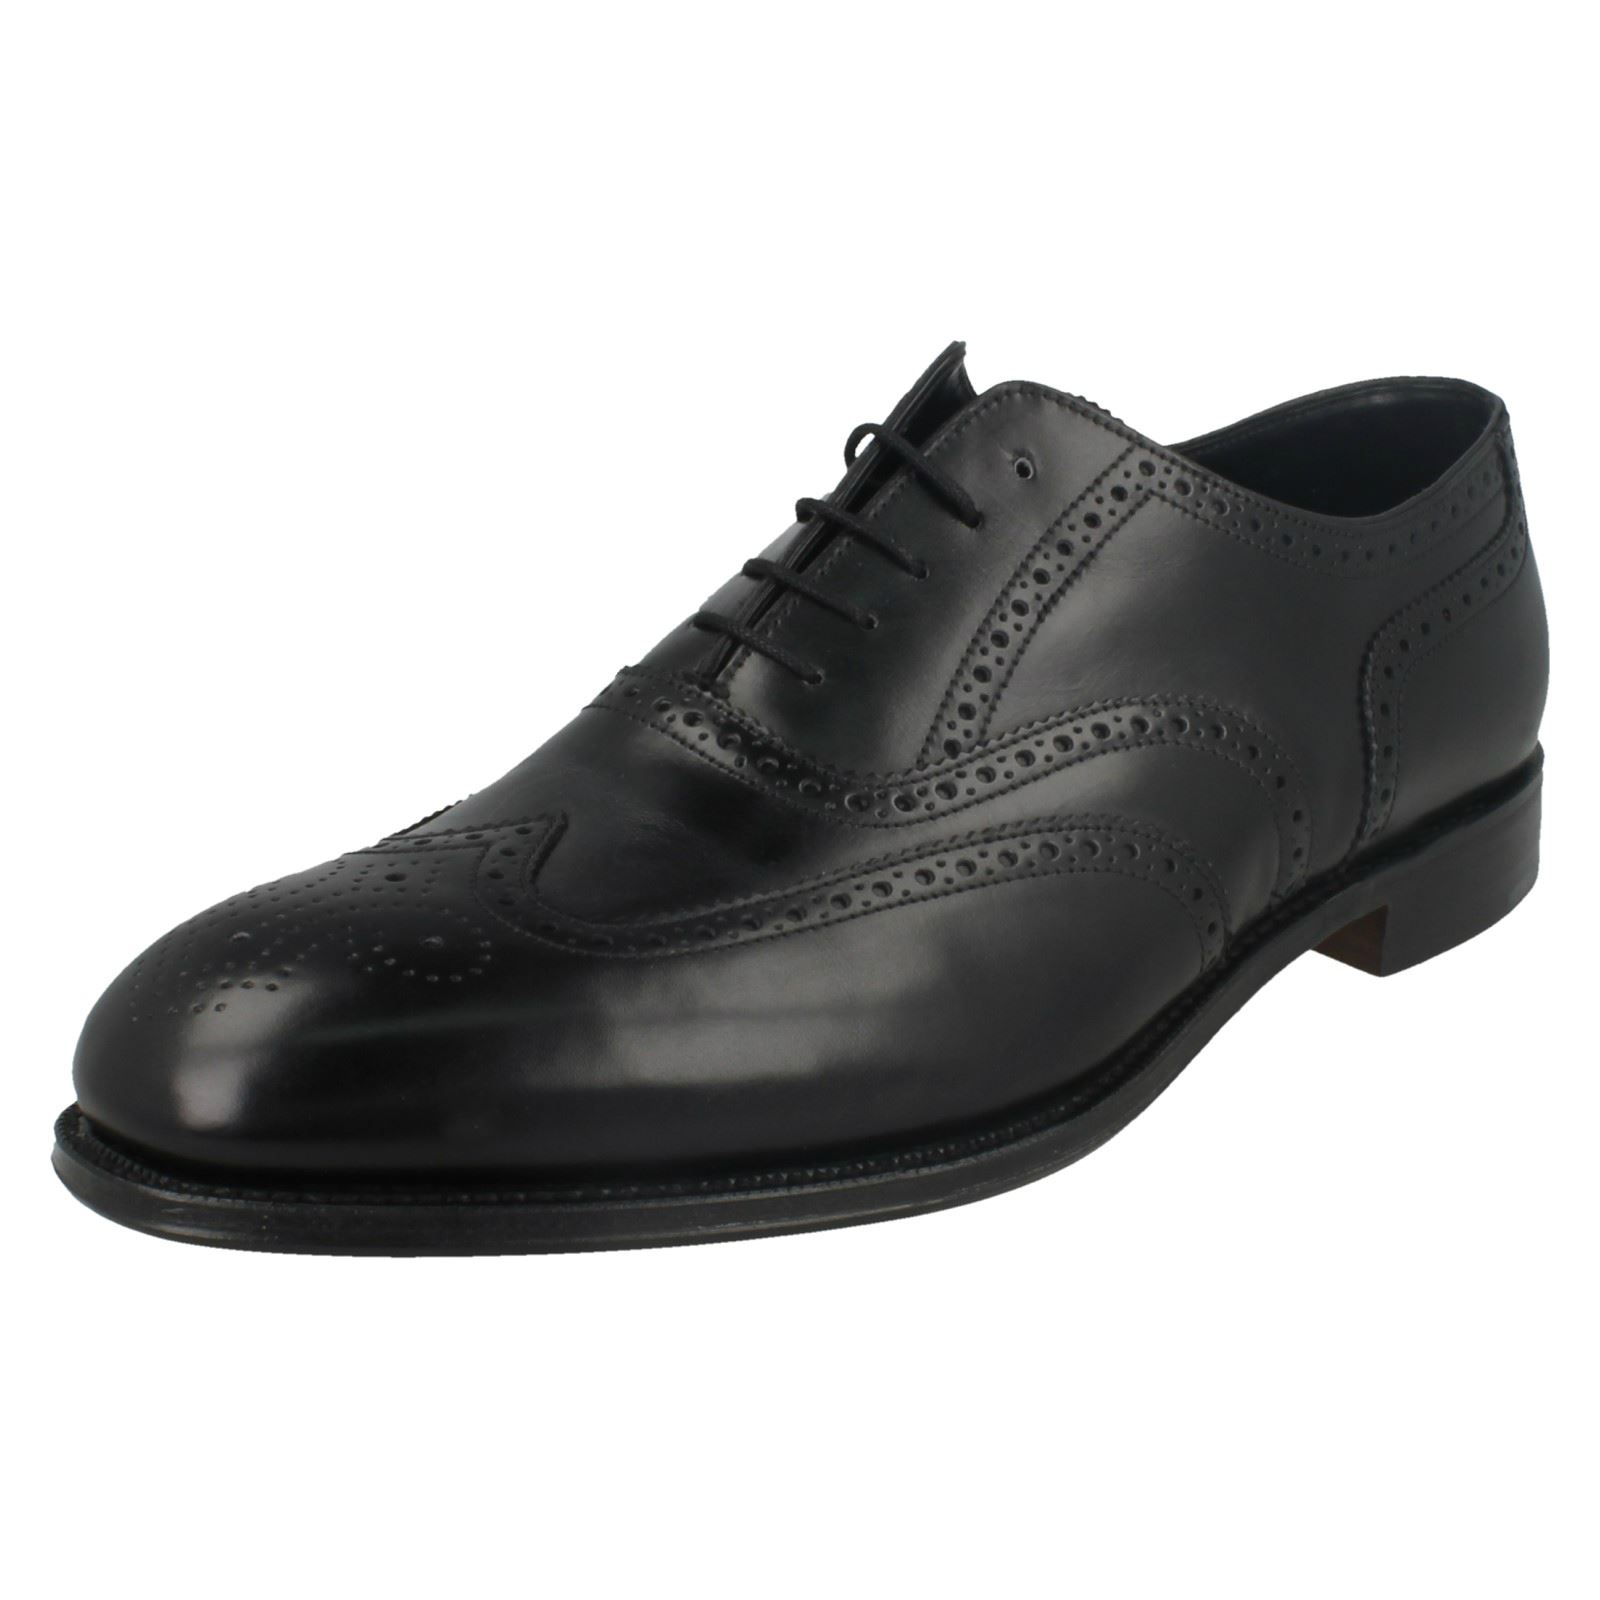 Da Uomo Loake In In In Pelle Lacci Punta Arrotondata CALATA SMART shoes -